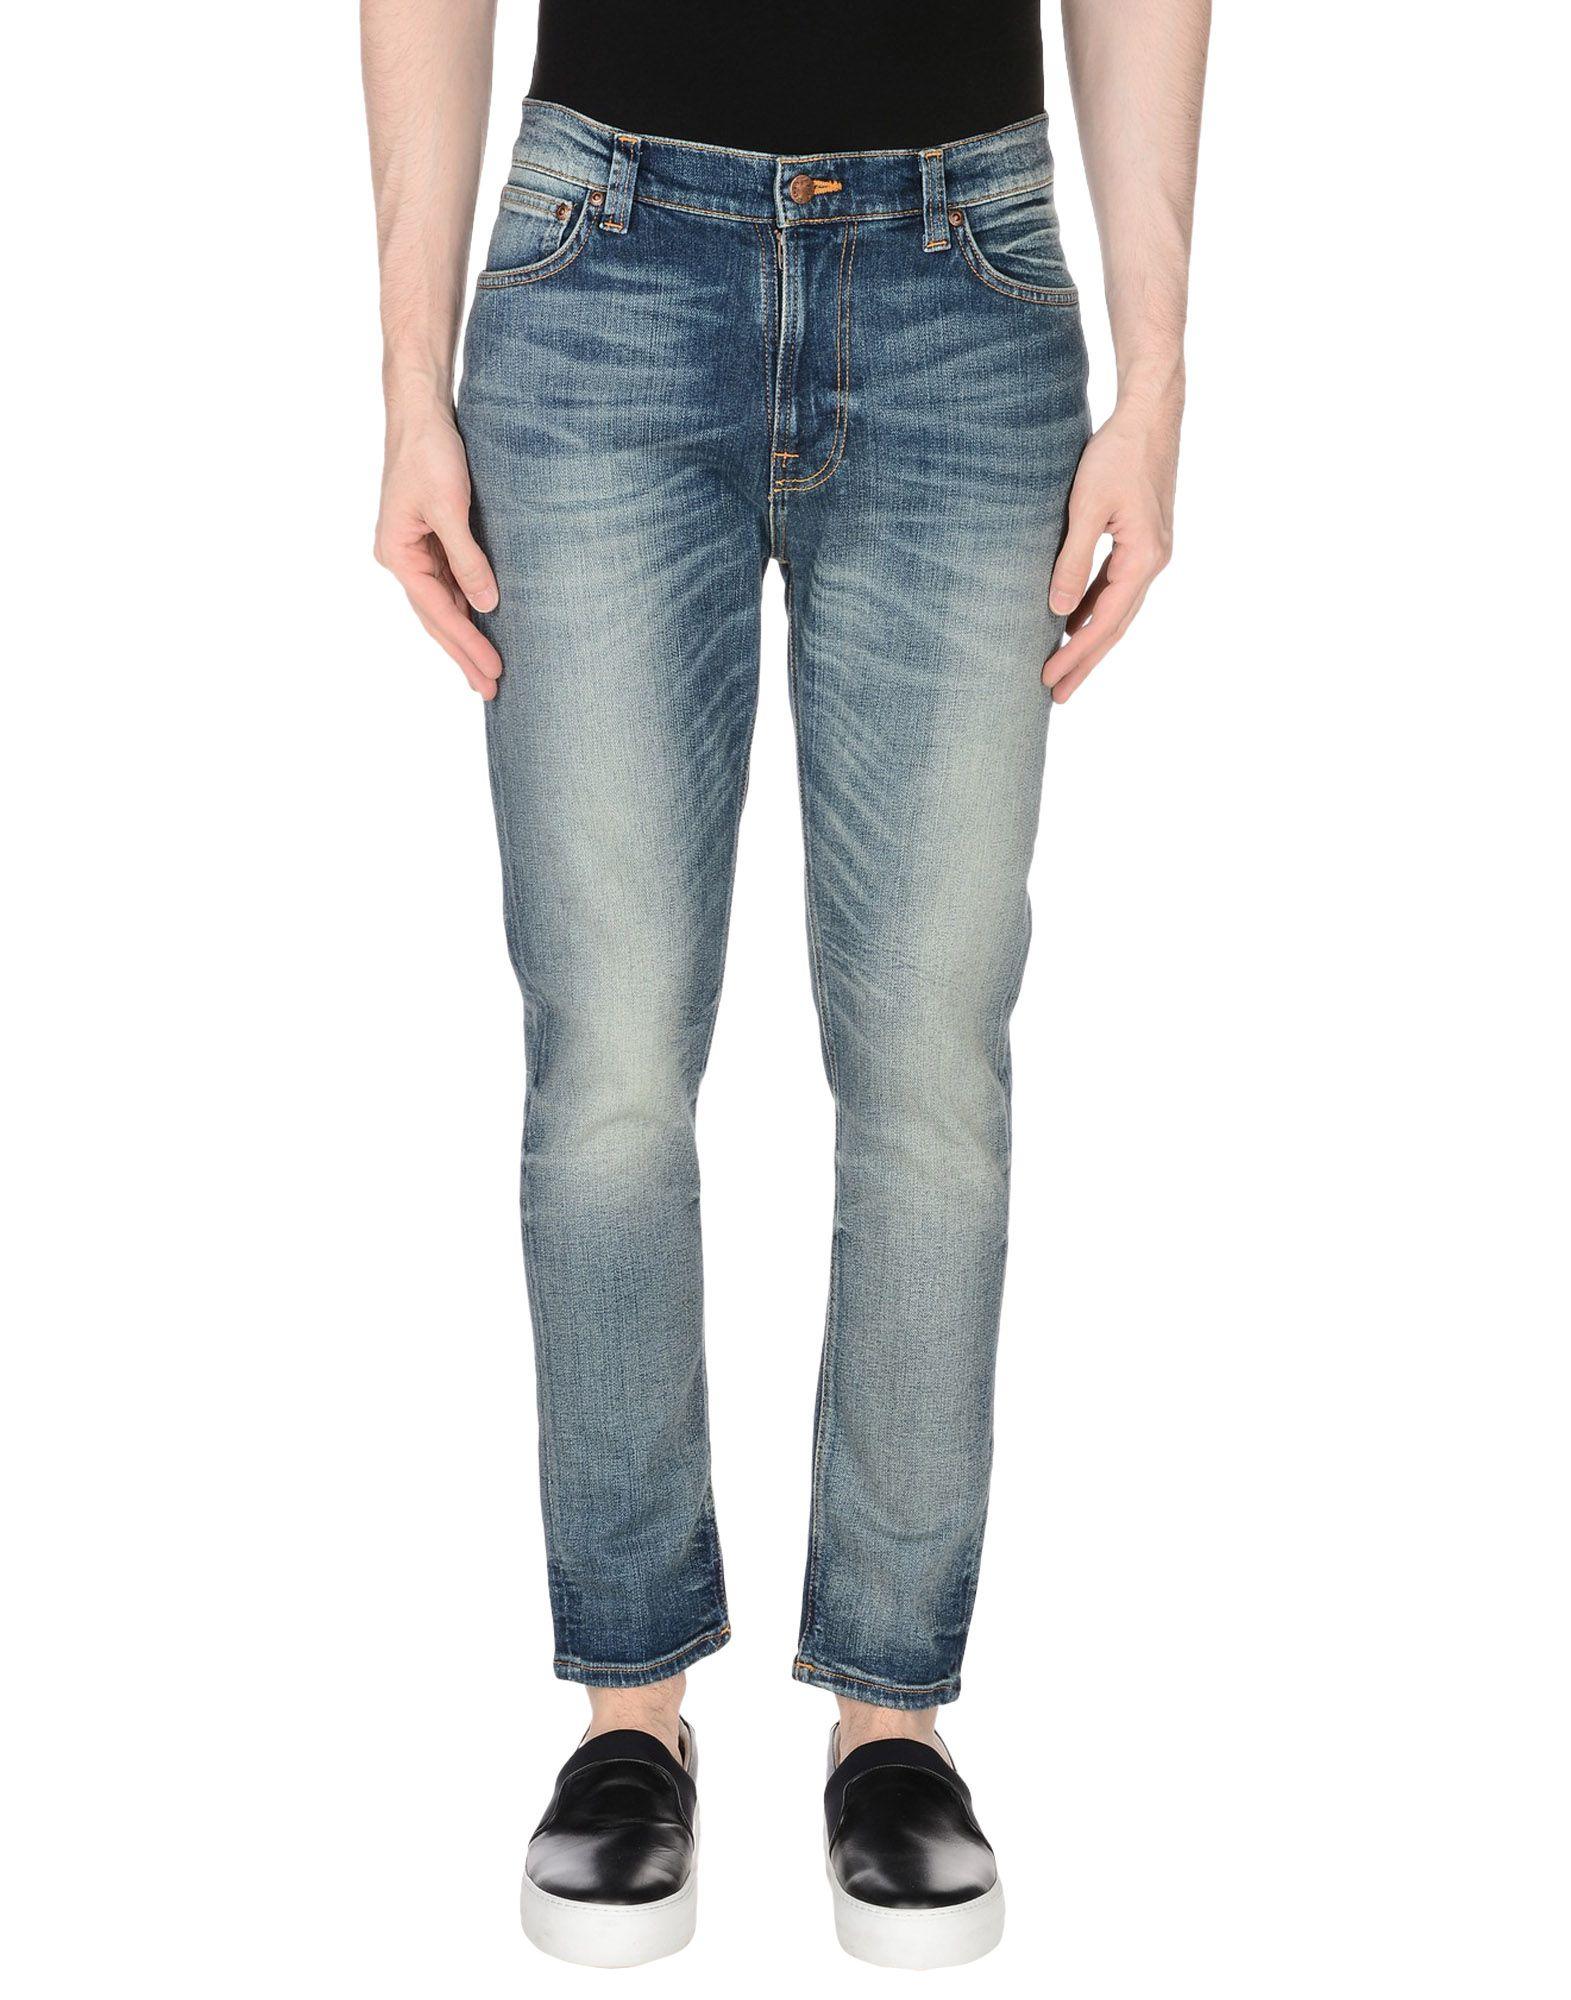 Pantaloni Jeans 42650738JR Nudie Jeans Co Uomo - 42650738JR Jeans 15c564